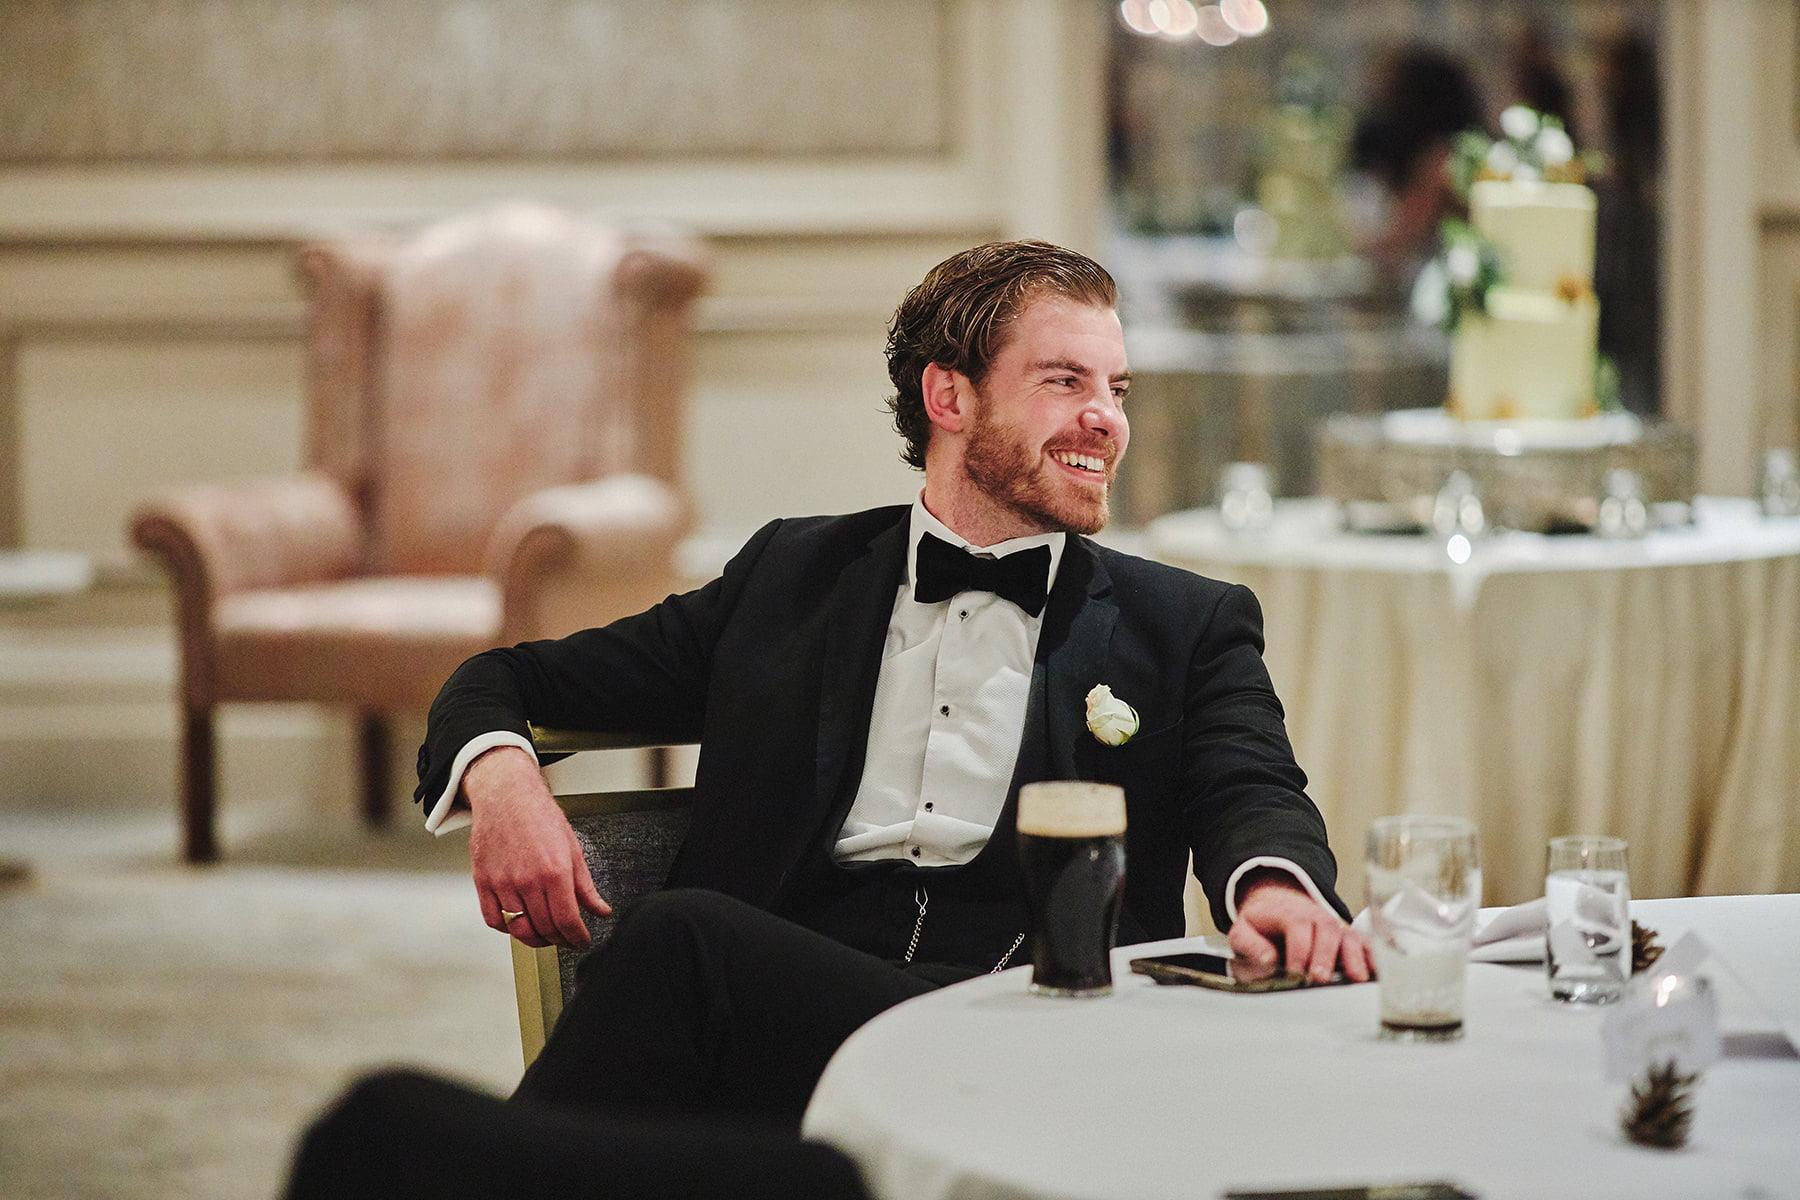 POWERSCOURT HOTEL RESORT INTIMATE WEDDING 93